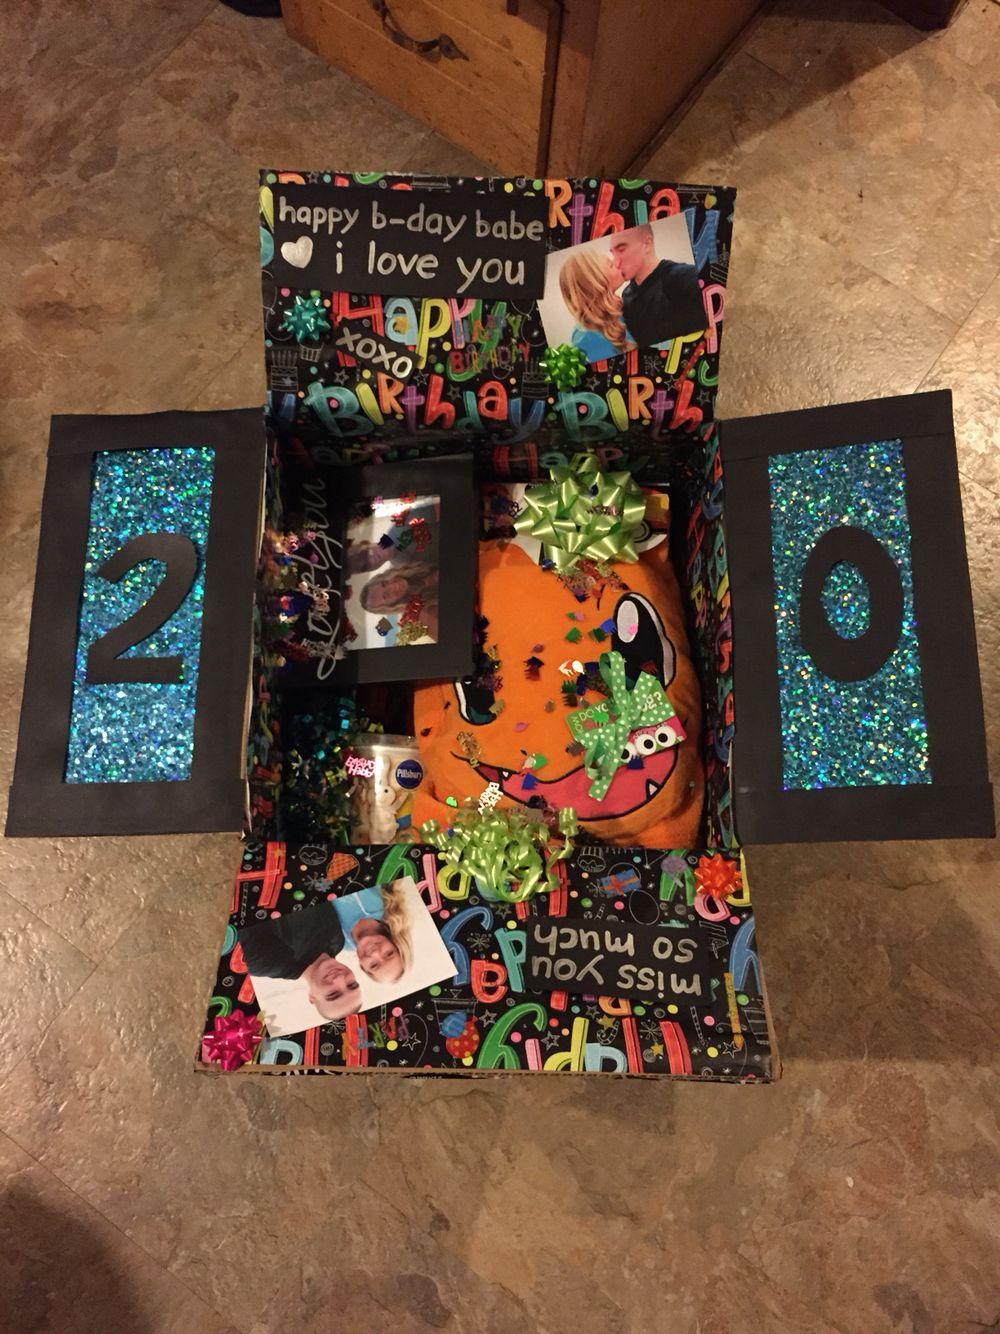 birthday care package for my boyfriend! Birthday care